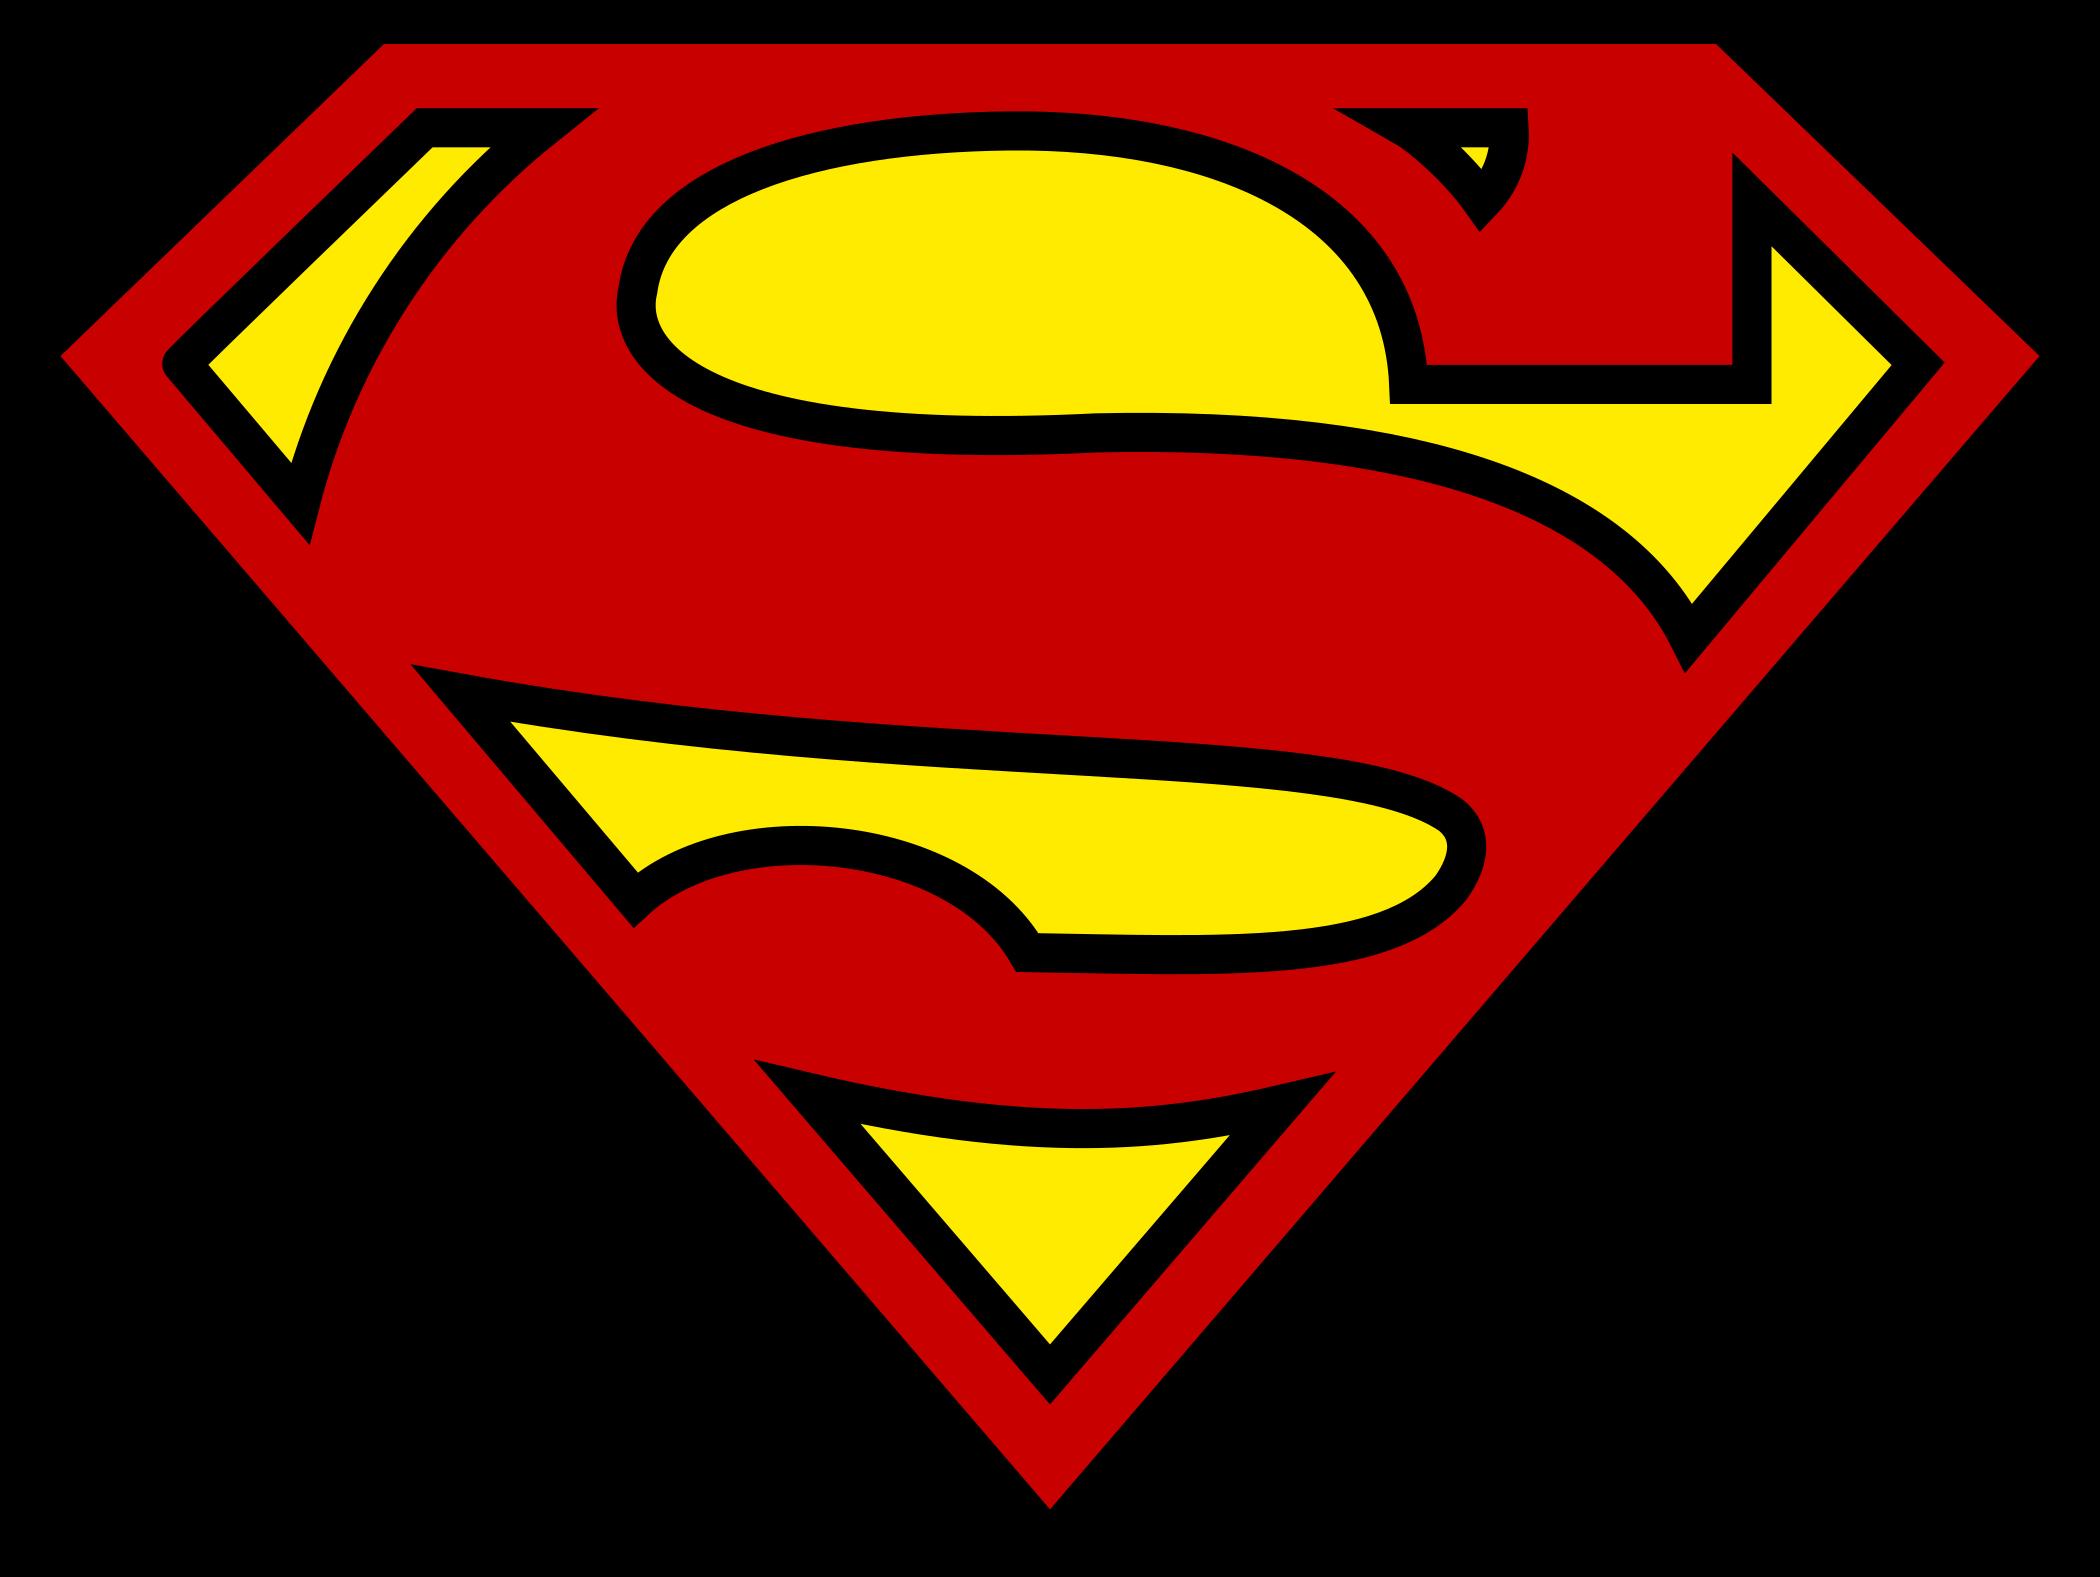 superman logo super homem 2 - Superman Logo - Super Homem Logo